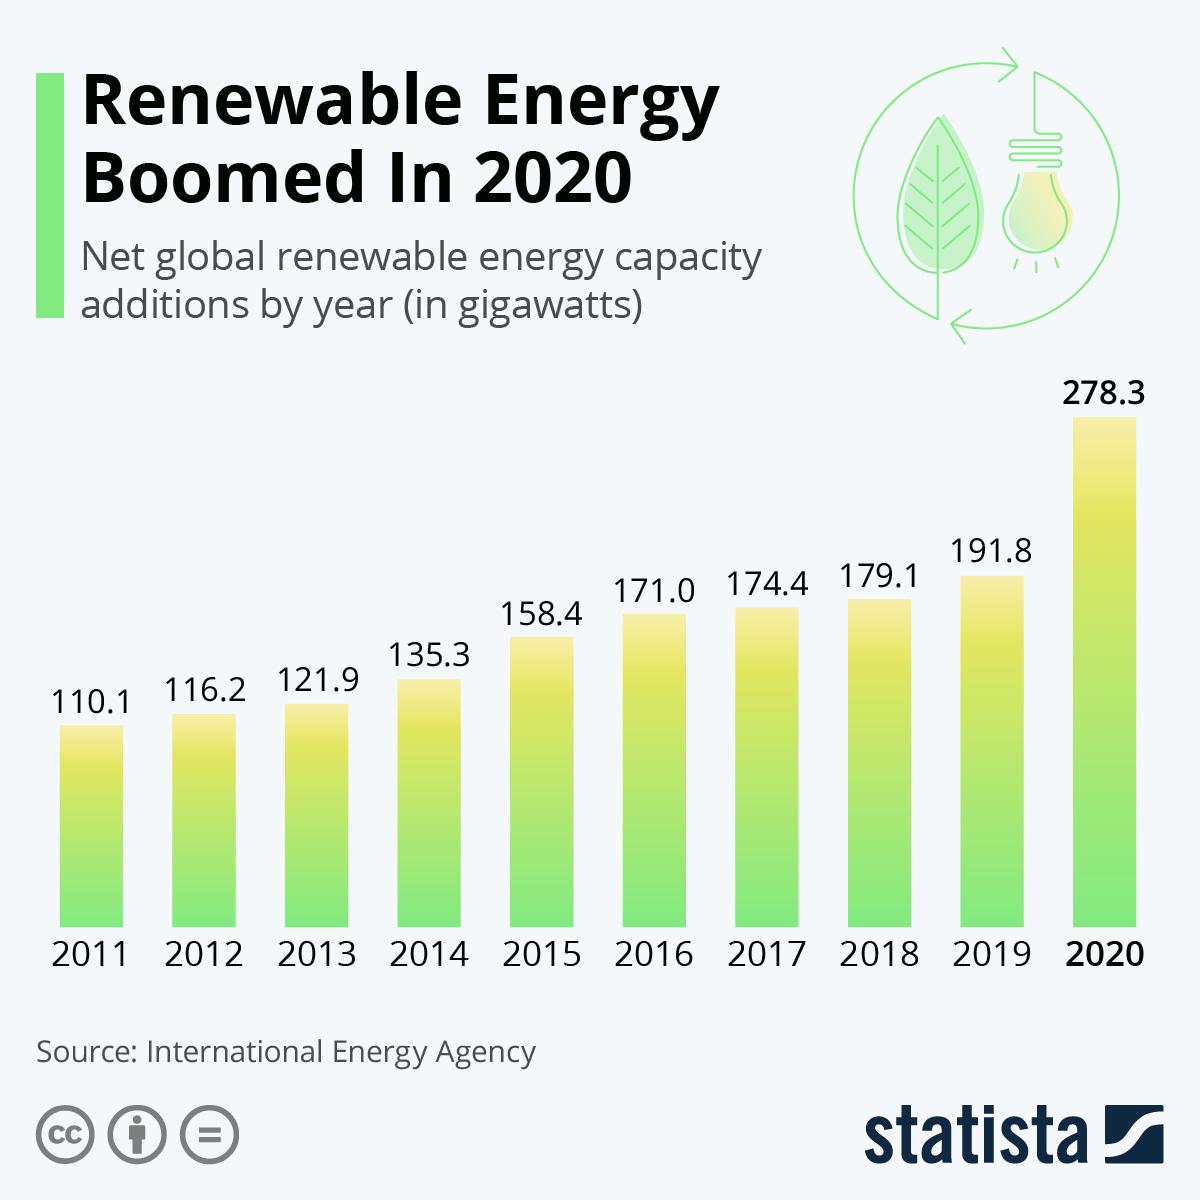 Renewable Energy Boomed In 2020